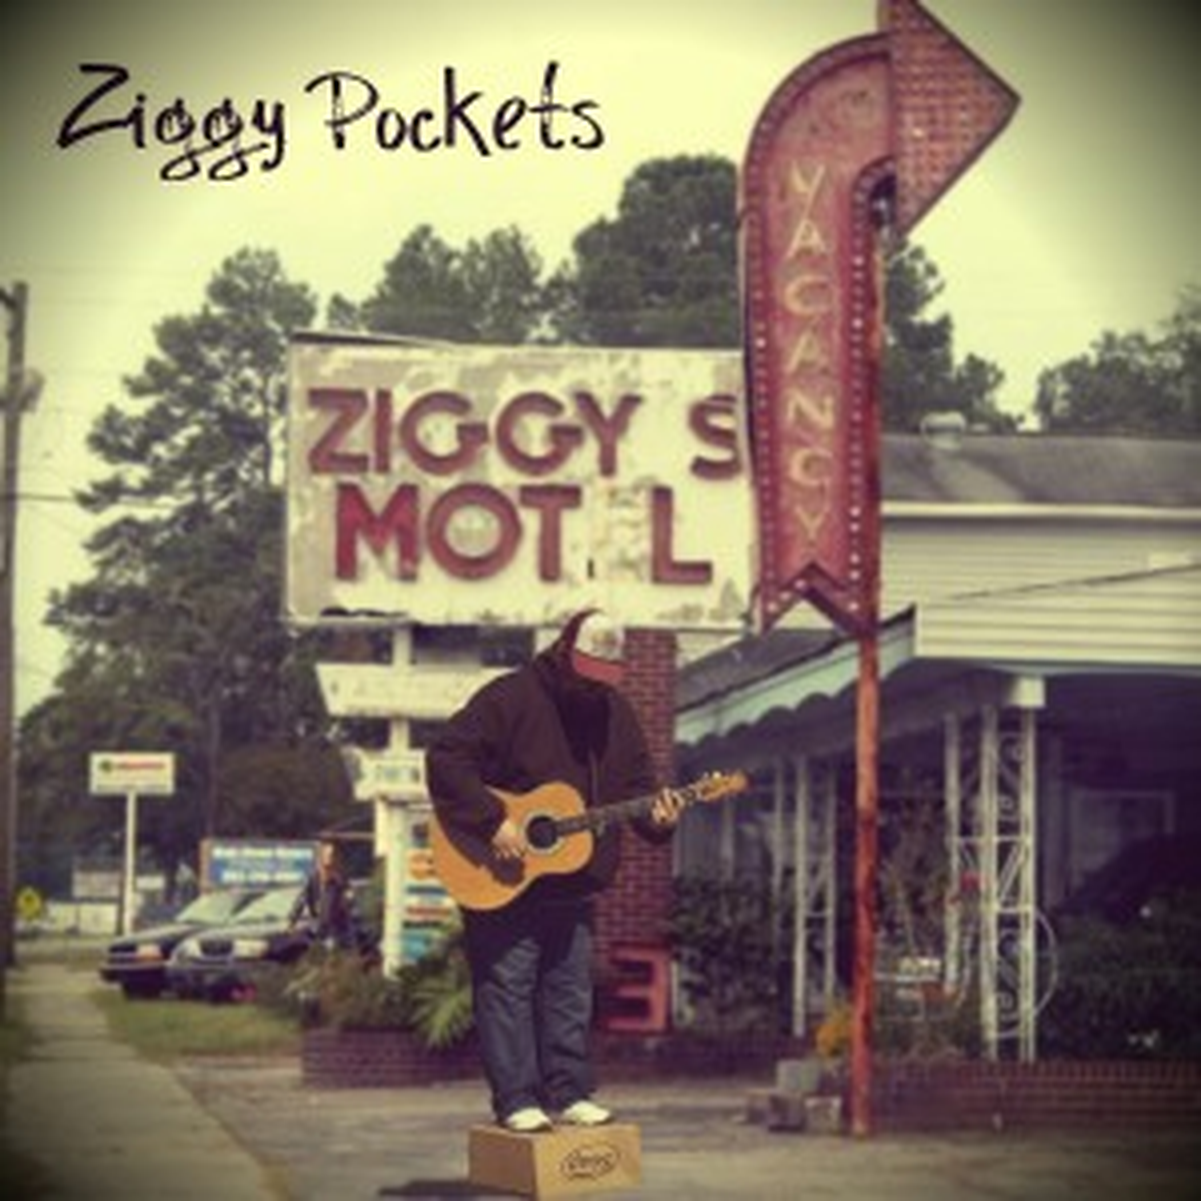 Ziggy Pockets